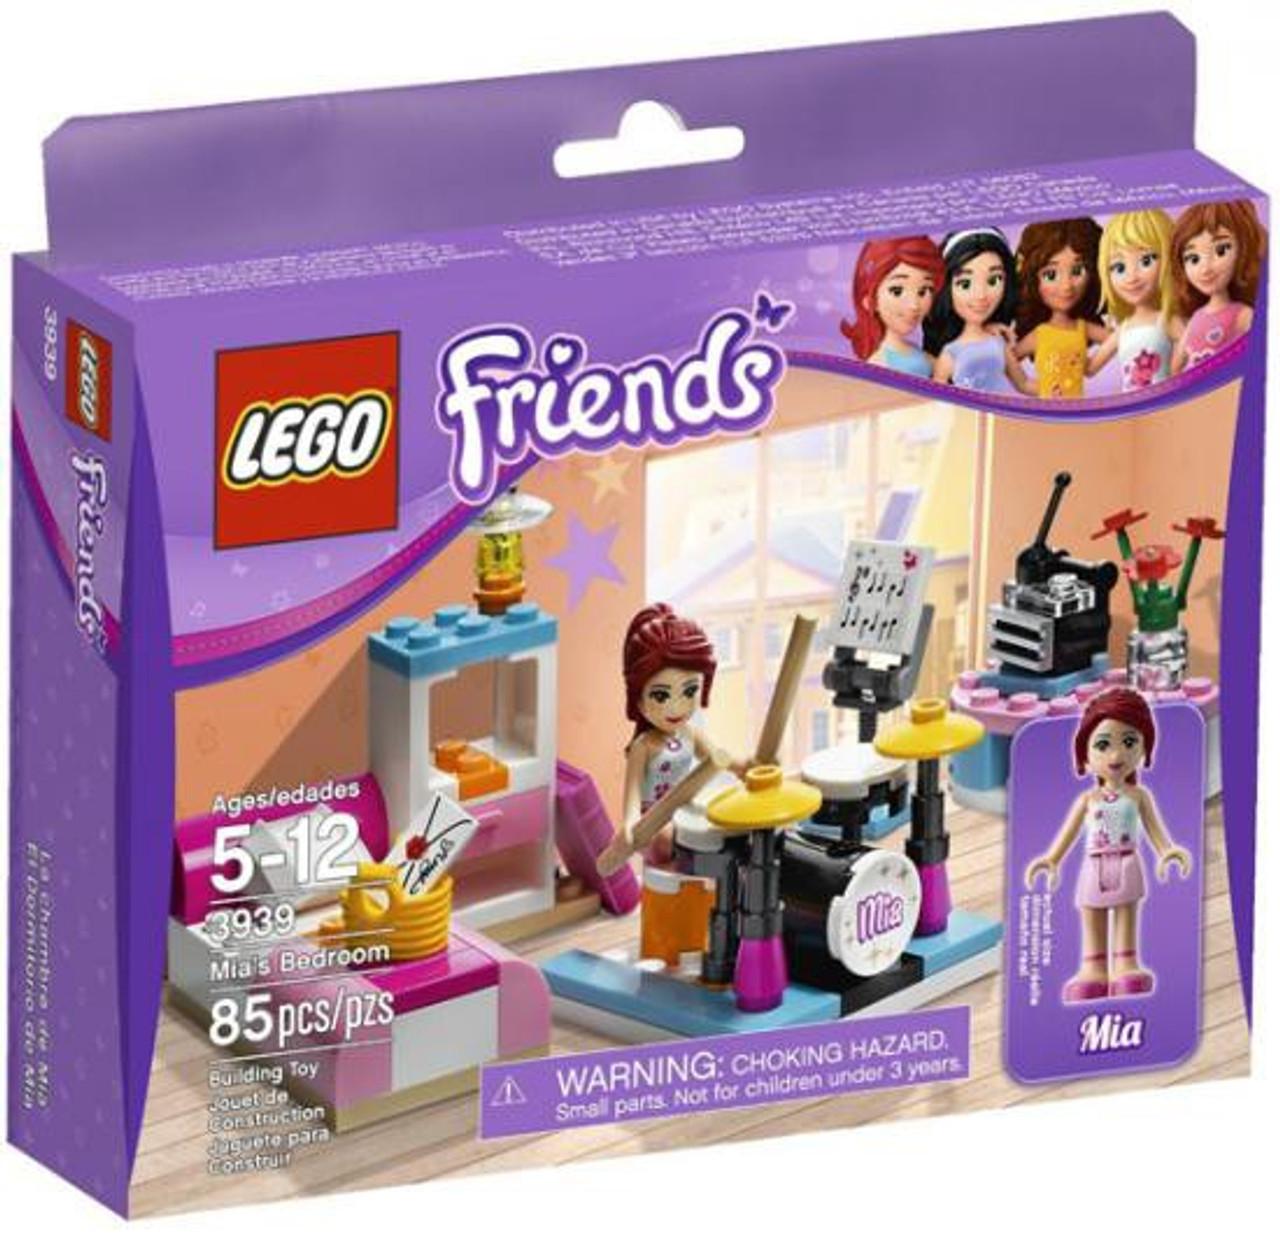 LEGO Friends Mia's Bedroom Set #3939